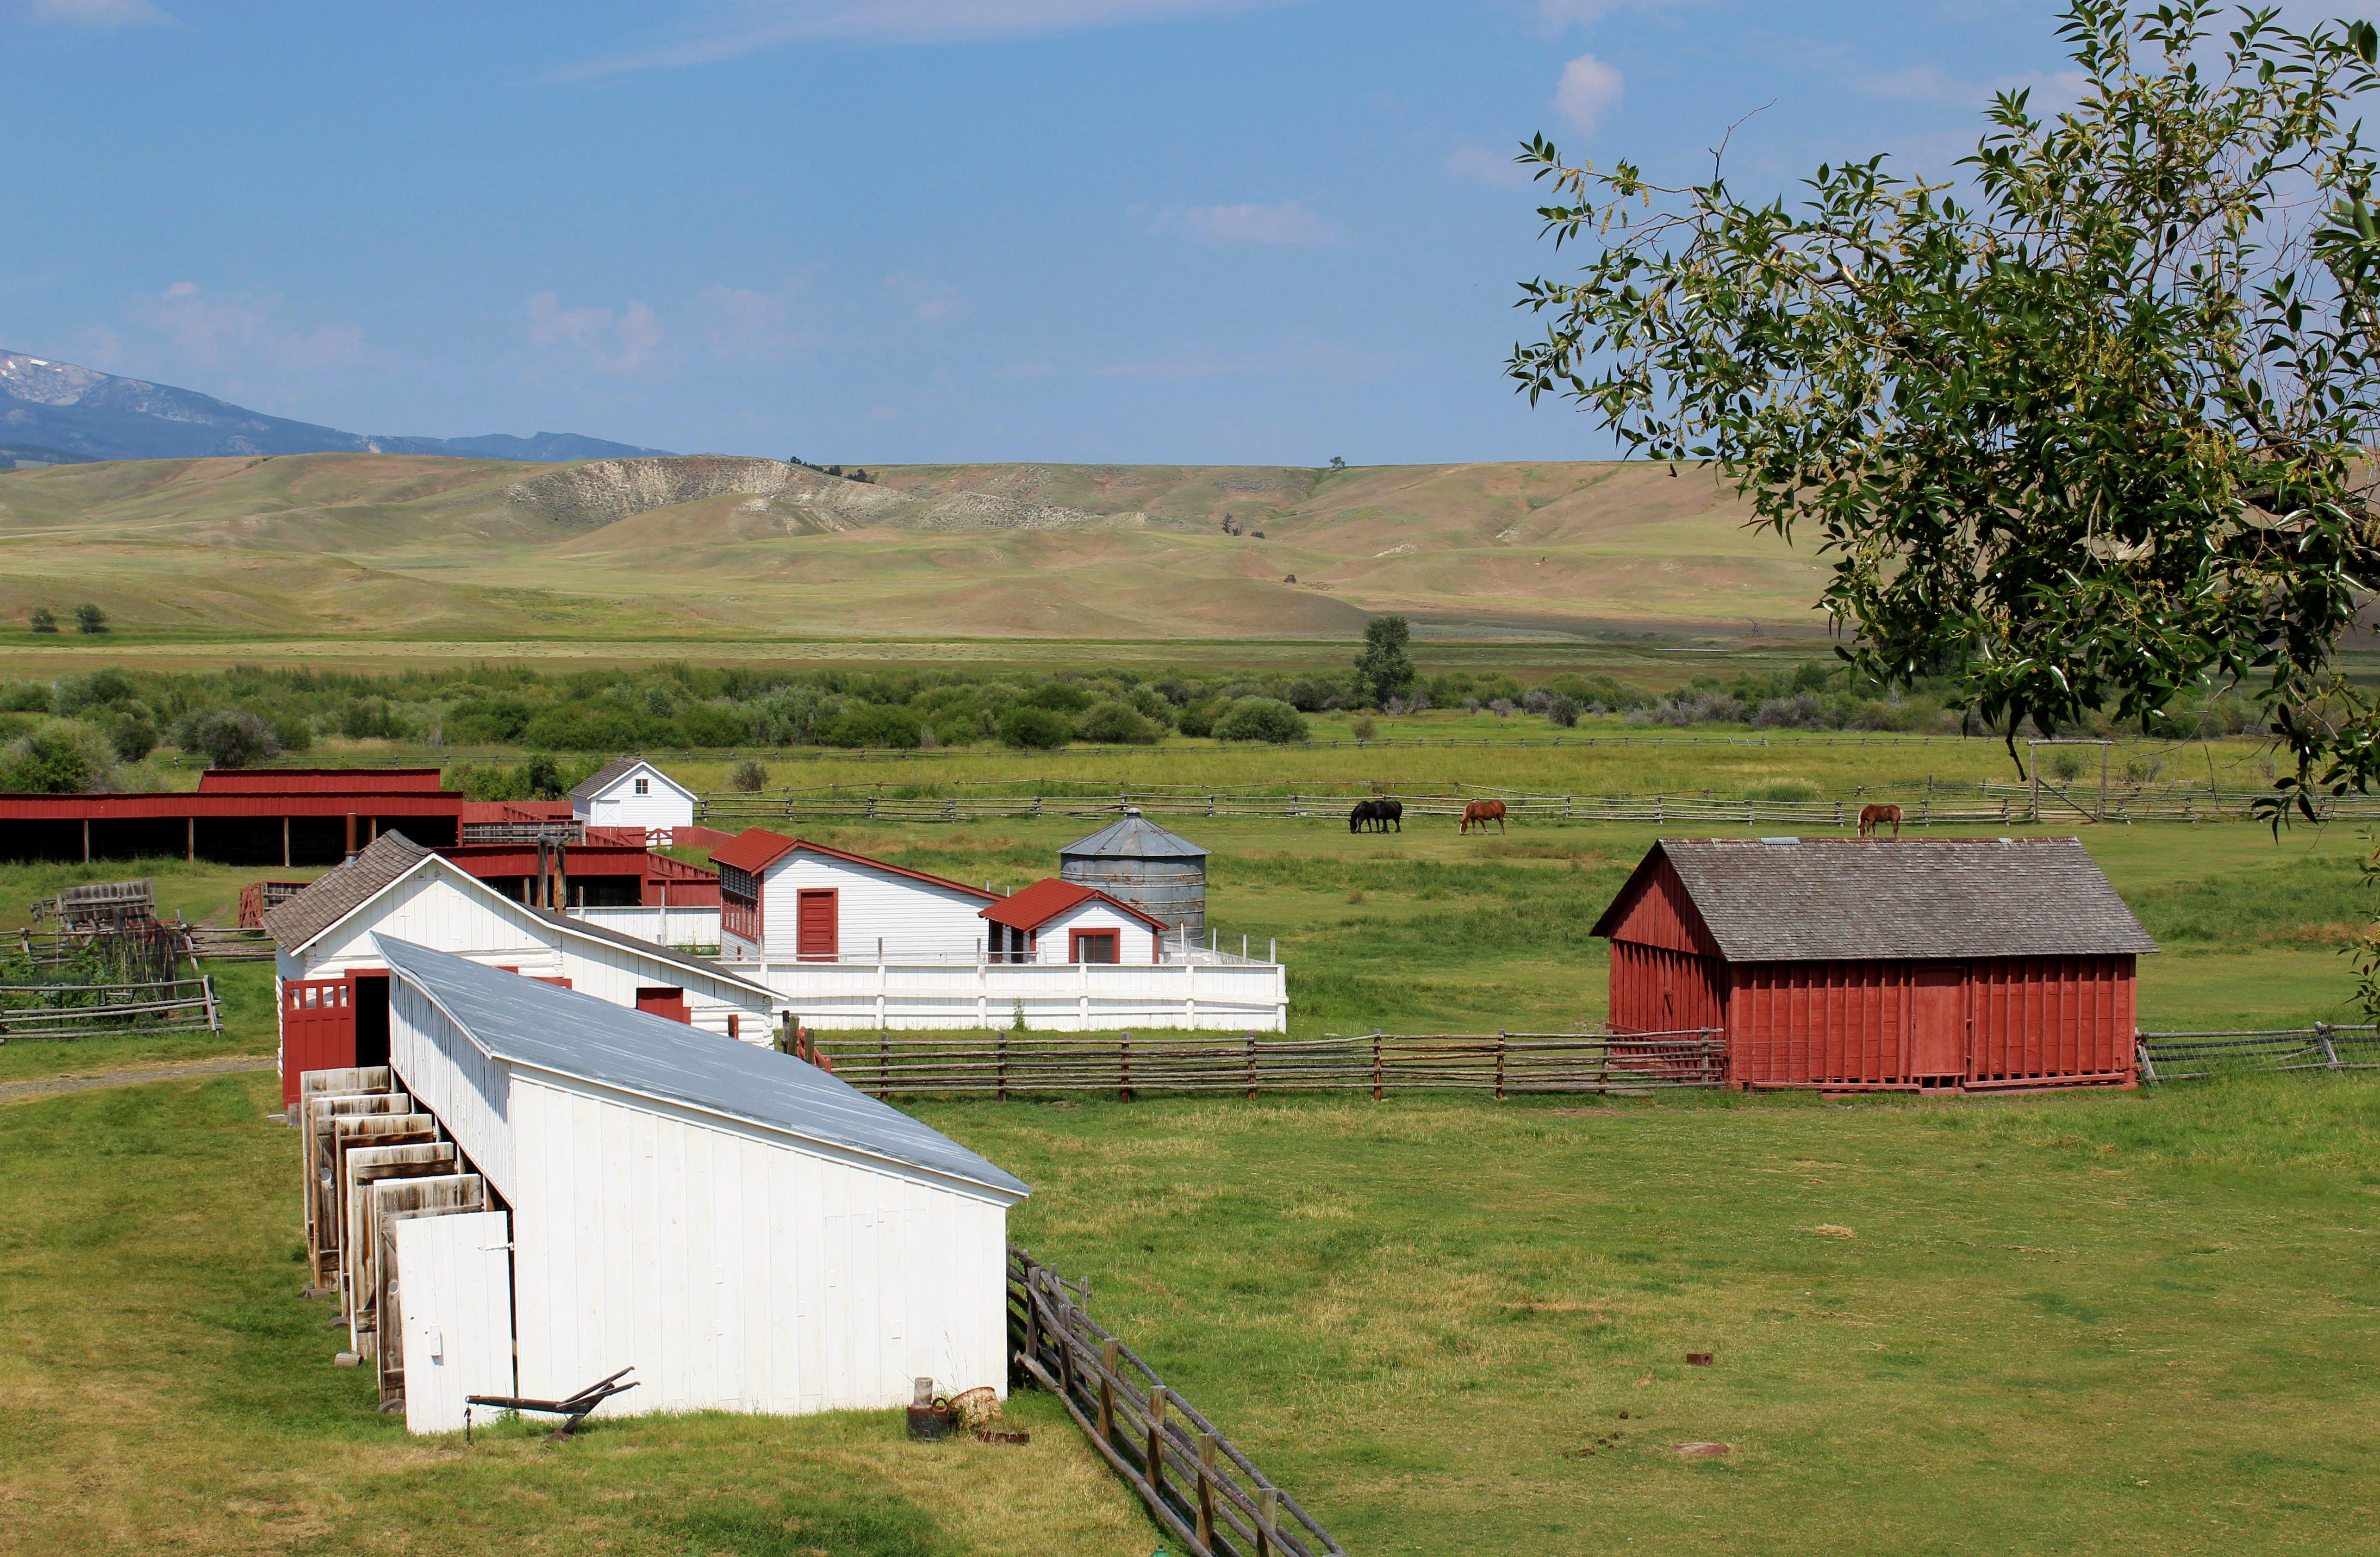 Johnny Grant, Conrad Kohrs, and the Grant Kohrs Ranch